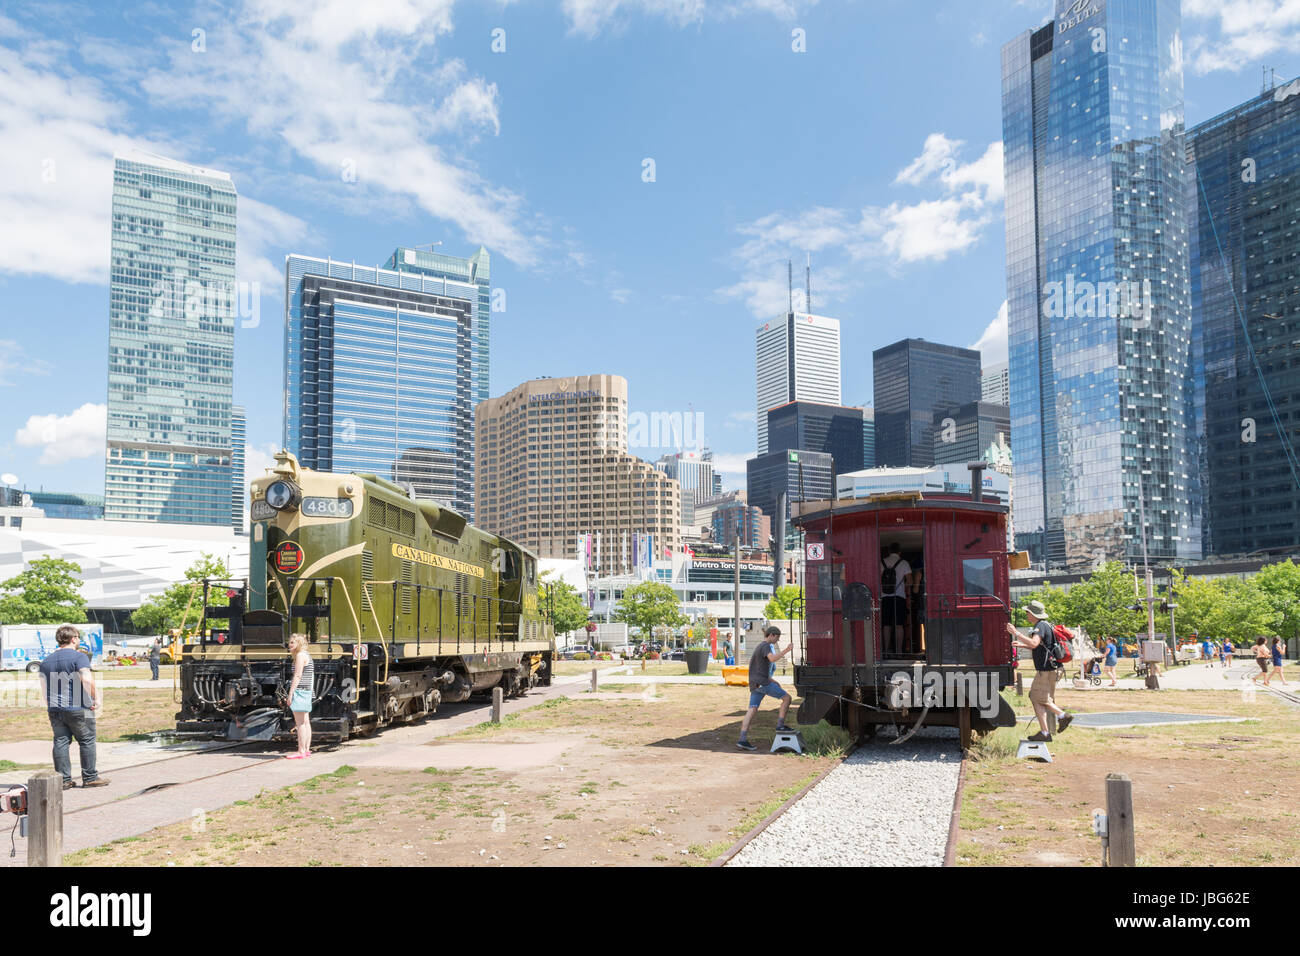 Toronto Railway Museum - Stock Image